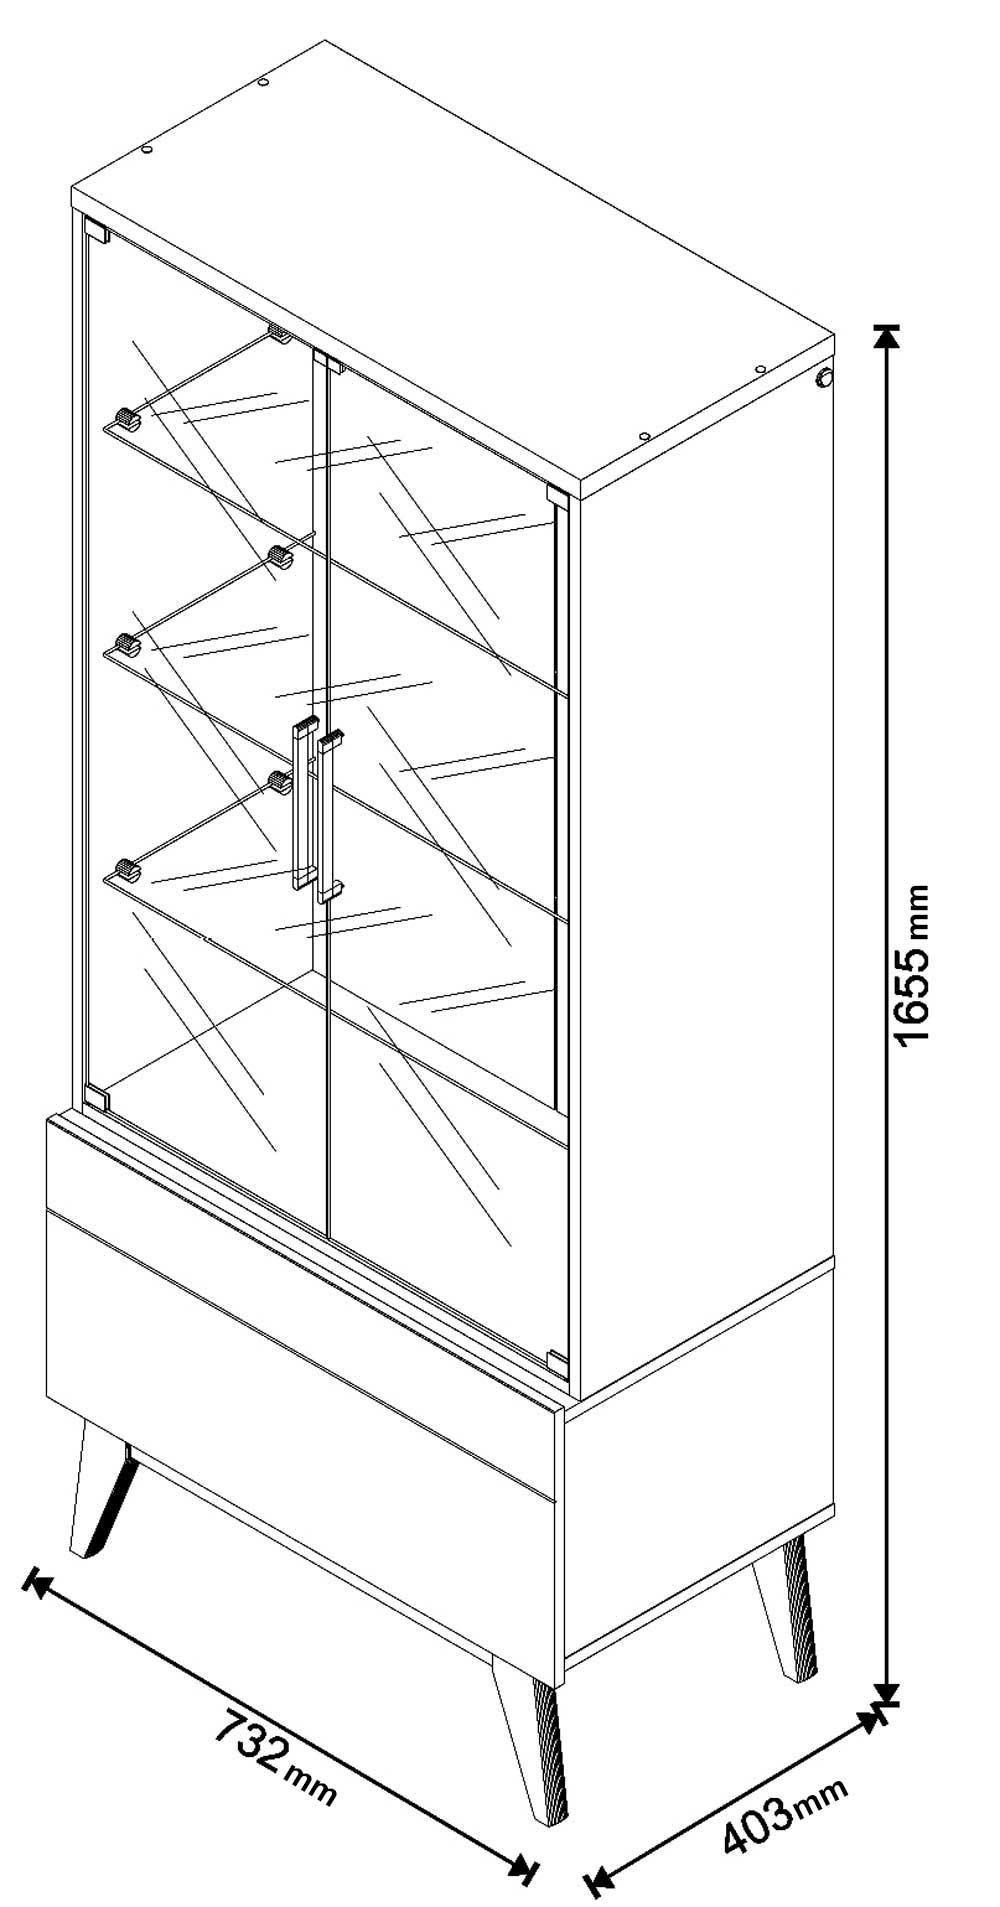 Cristaleira Classic 1G Freijó - Imcal Móveis